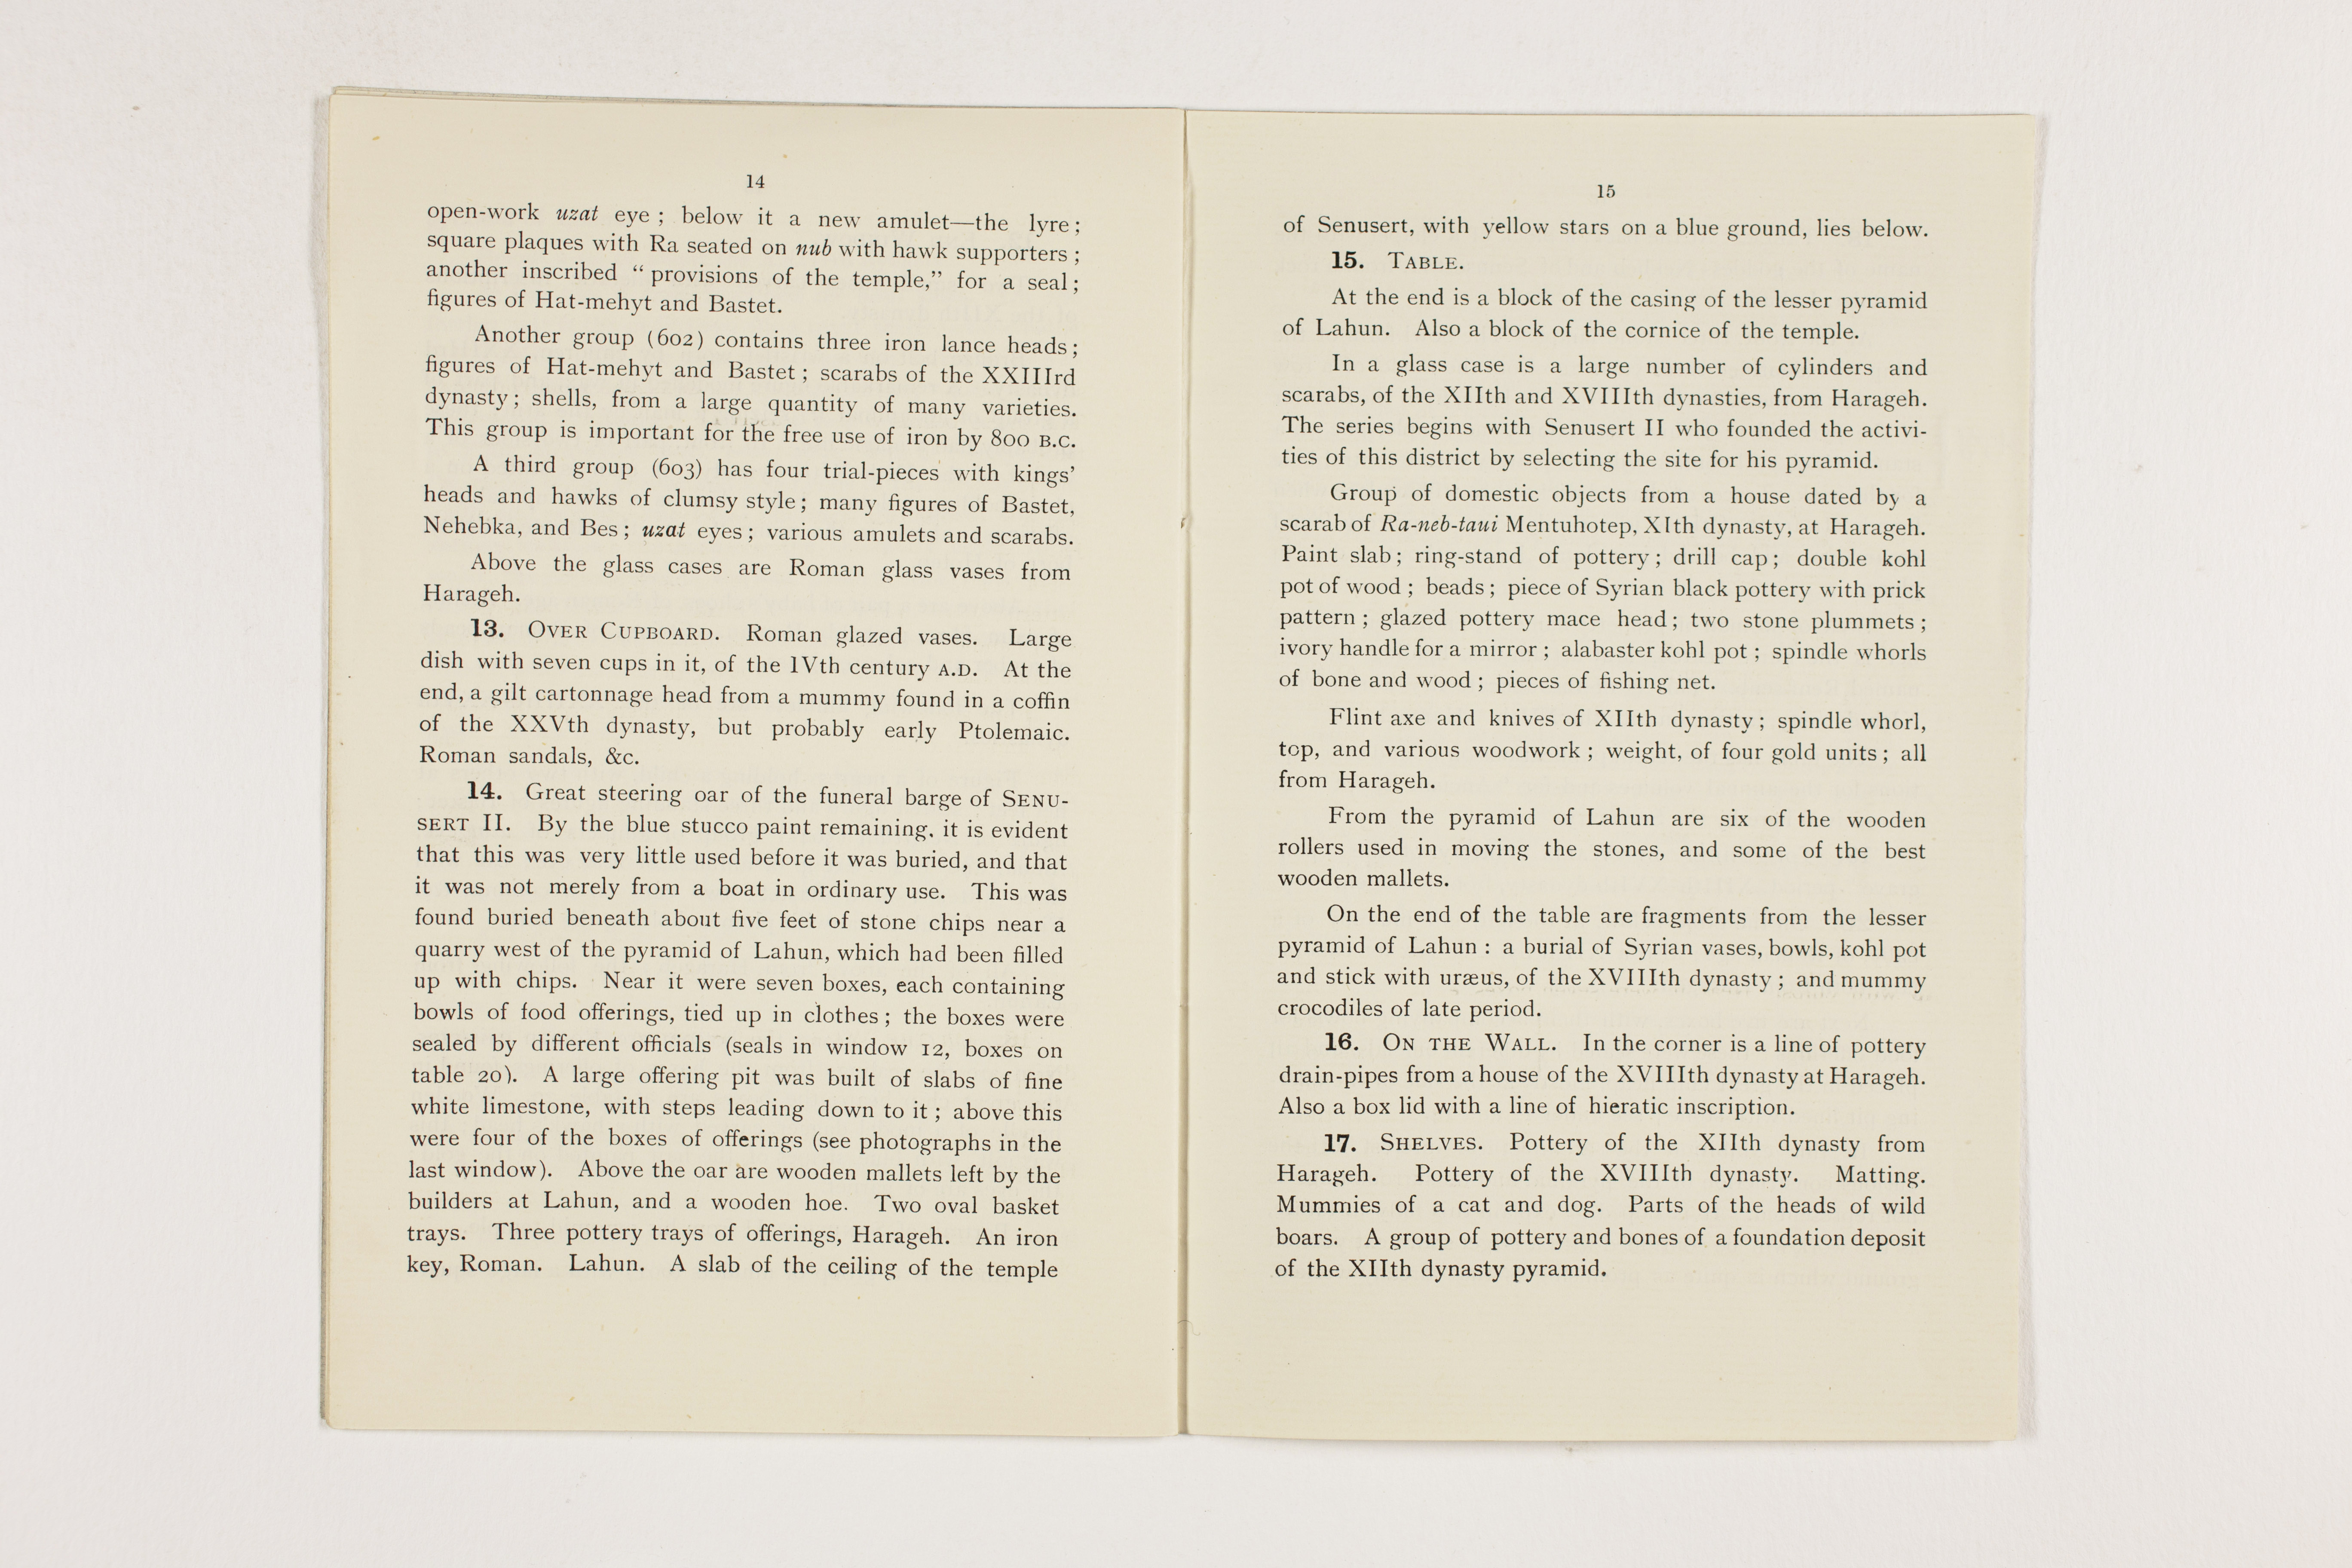 1913-14 Lahun, Haraga Exhibition catalogue PMA/WFP1/D/22/49.9